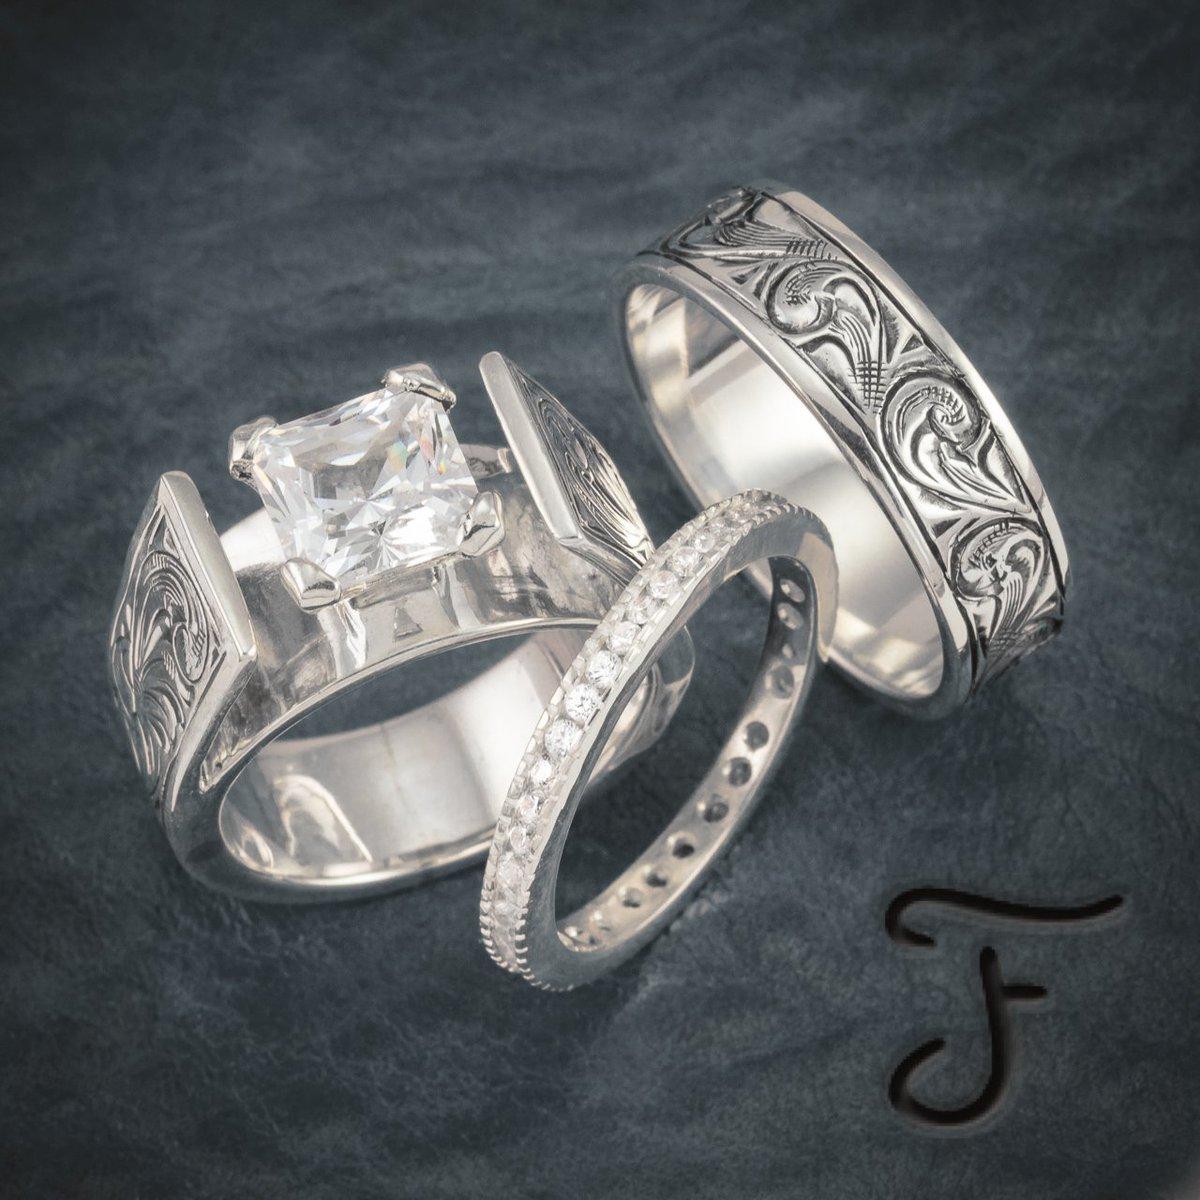 Fanning Jewelry On Twitter Checkout Stcosfwilbpf3r's Wedding Sets Stco9kk8kuzevh Married Engaged Westernwedding Weddingrings: Western Wedding Rings Marriage At Websimilar.org